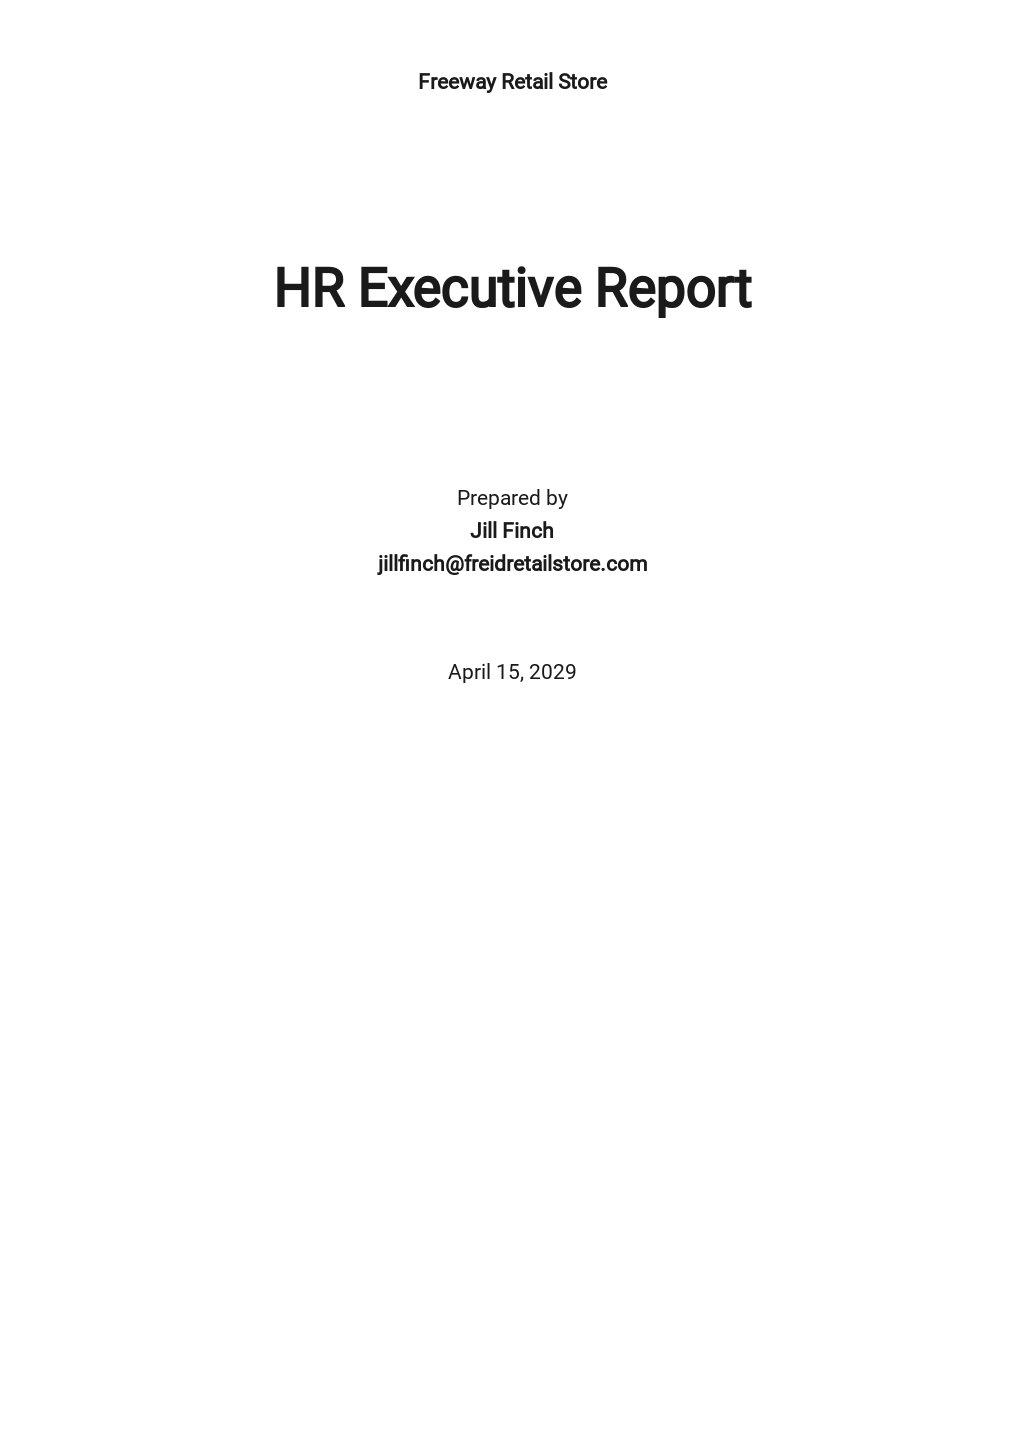 HR Executive Report Template.jpe